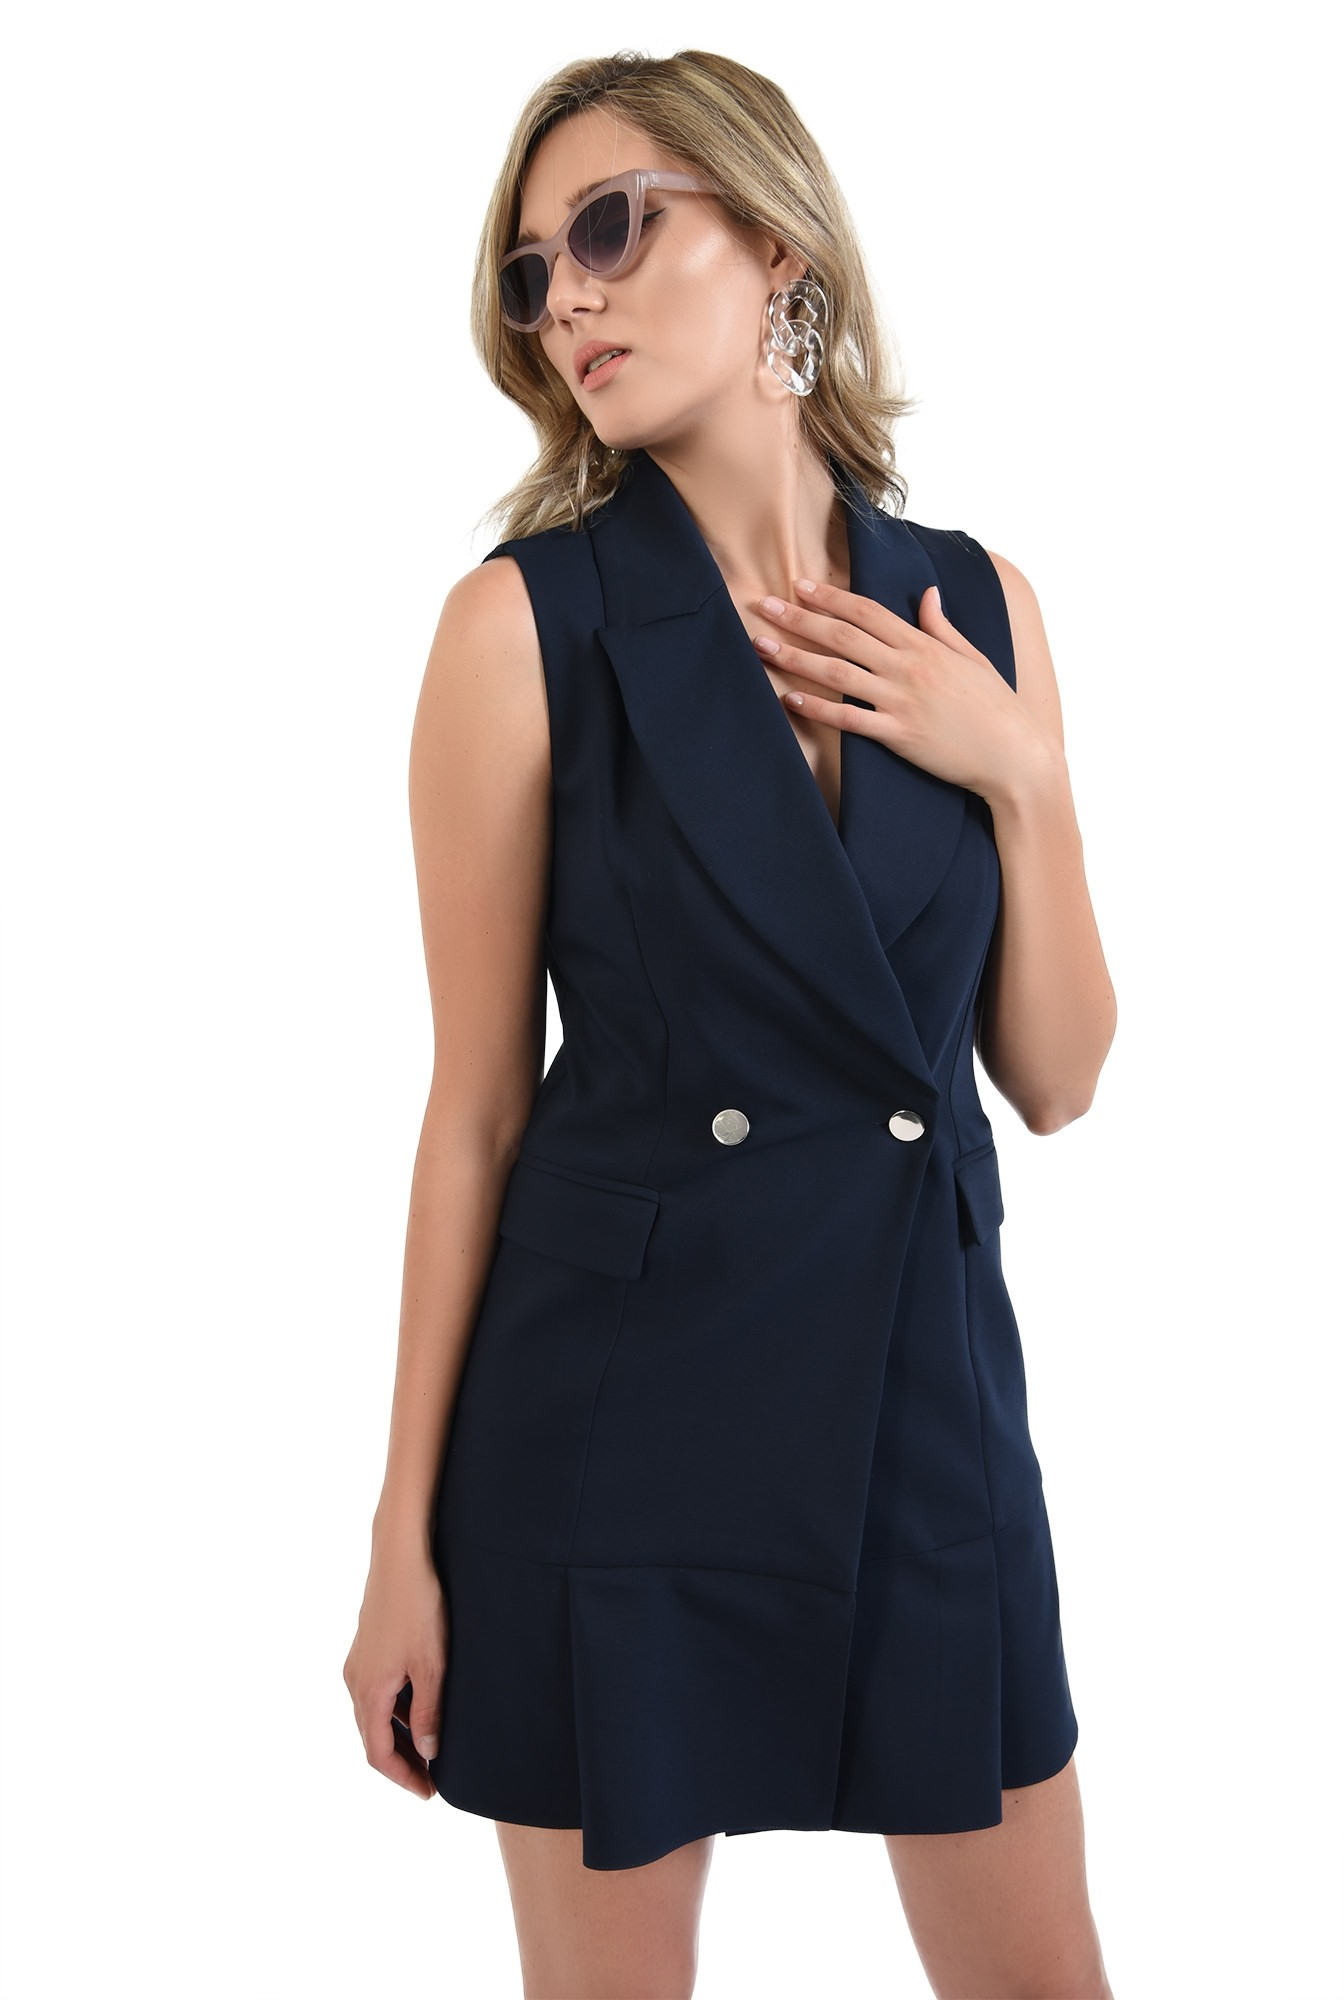 3 - 360 - rochie bleumarin, scurta, tip sacou, Poema